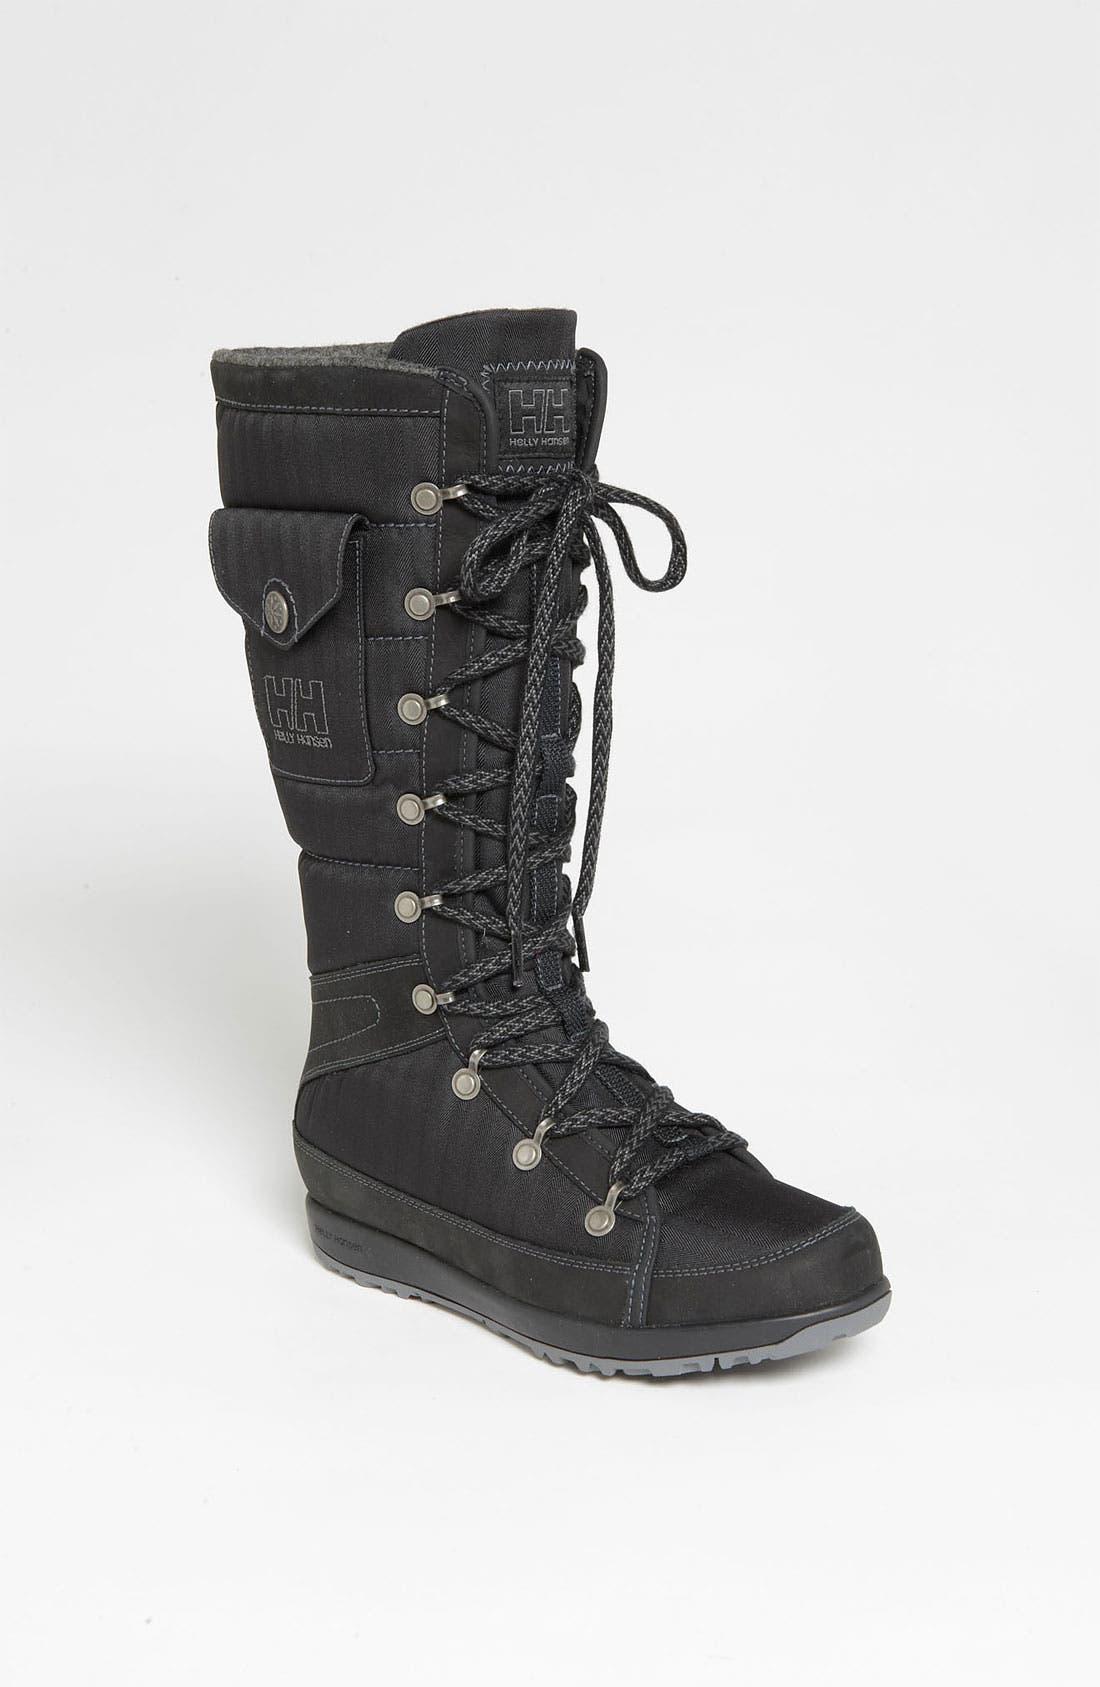 Main Image - Helly Hansen 'Parka' Boot